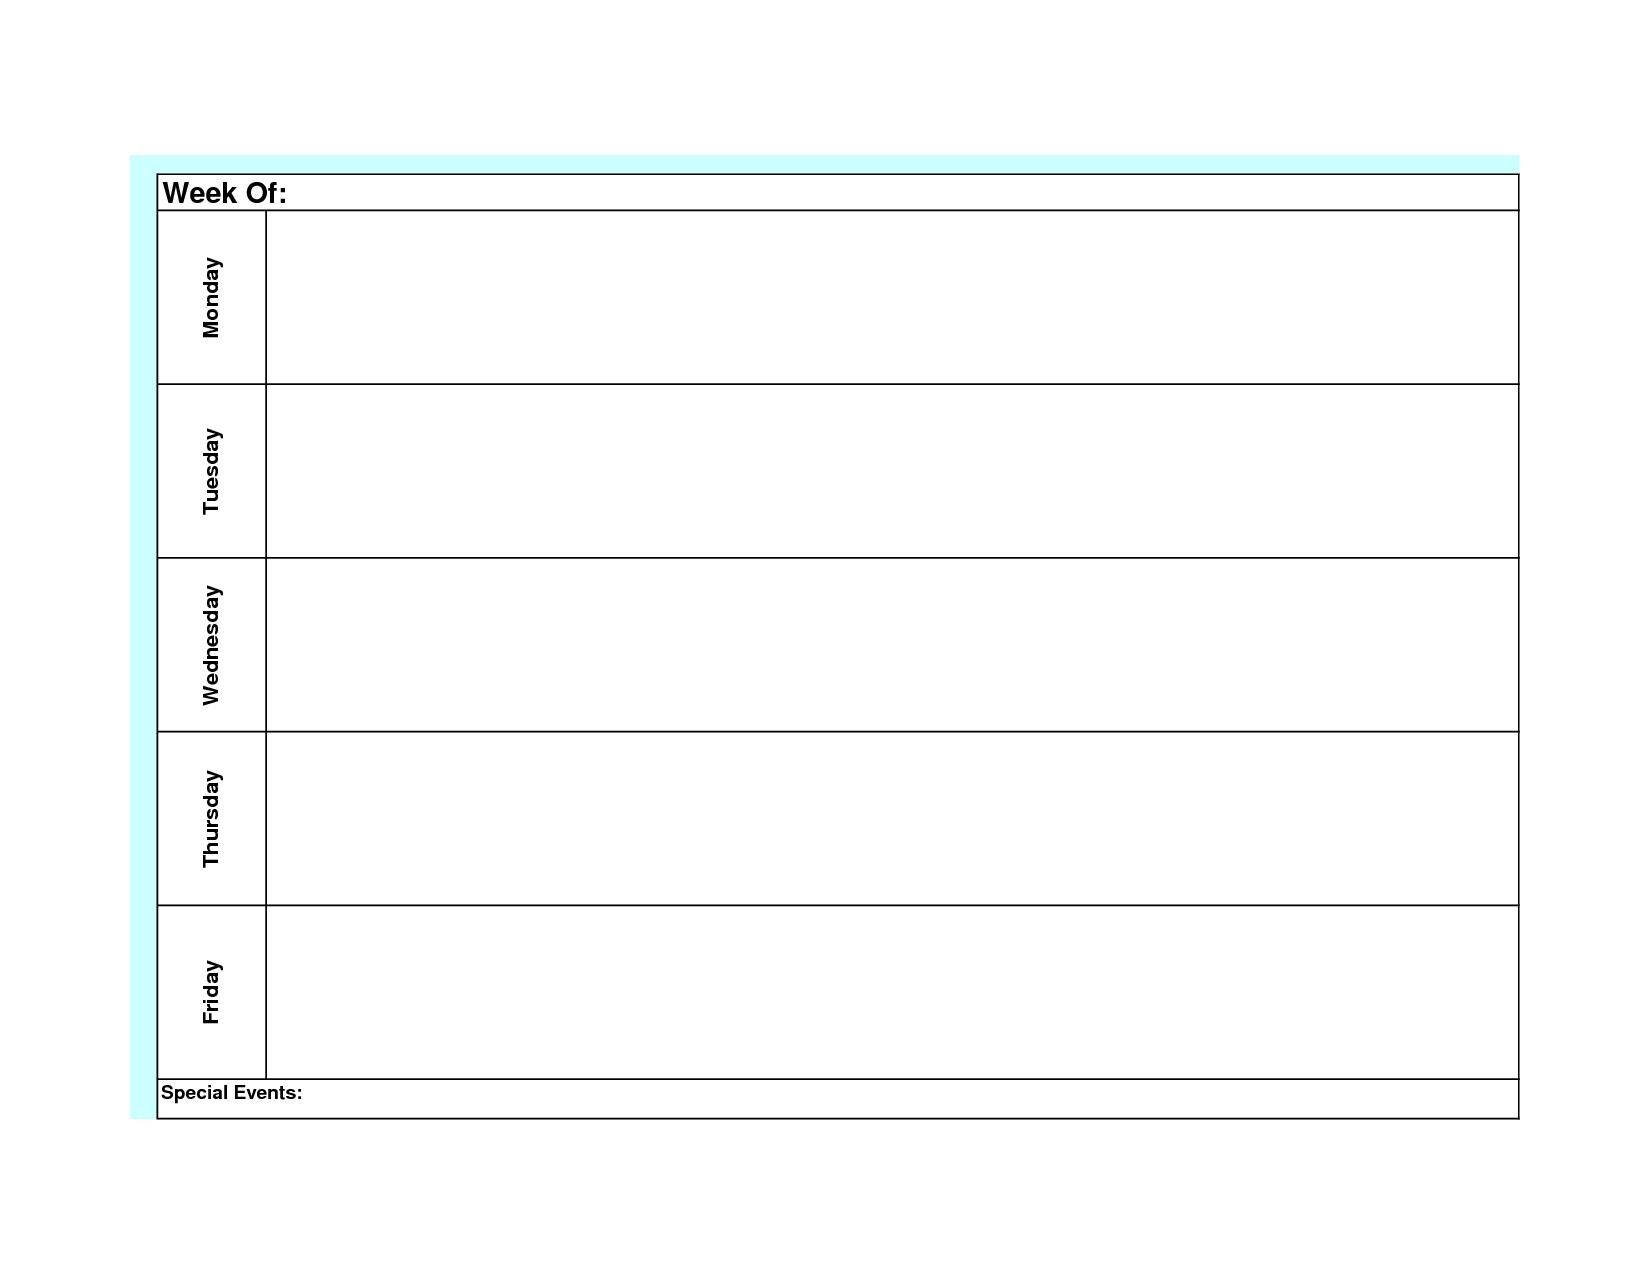 Blank Weekly Calendar Template Monday Friday (With Images Weekly Calendar Printable Monday Friday